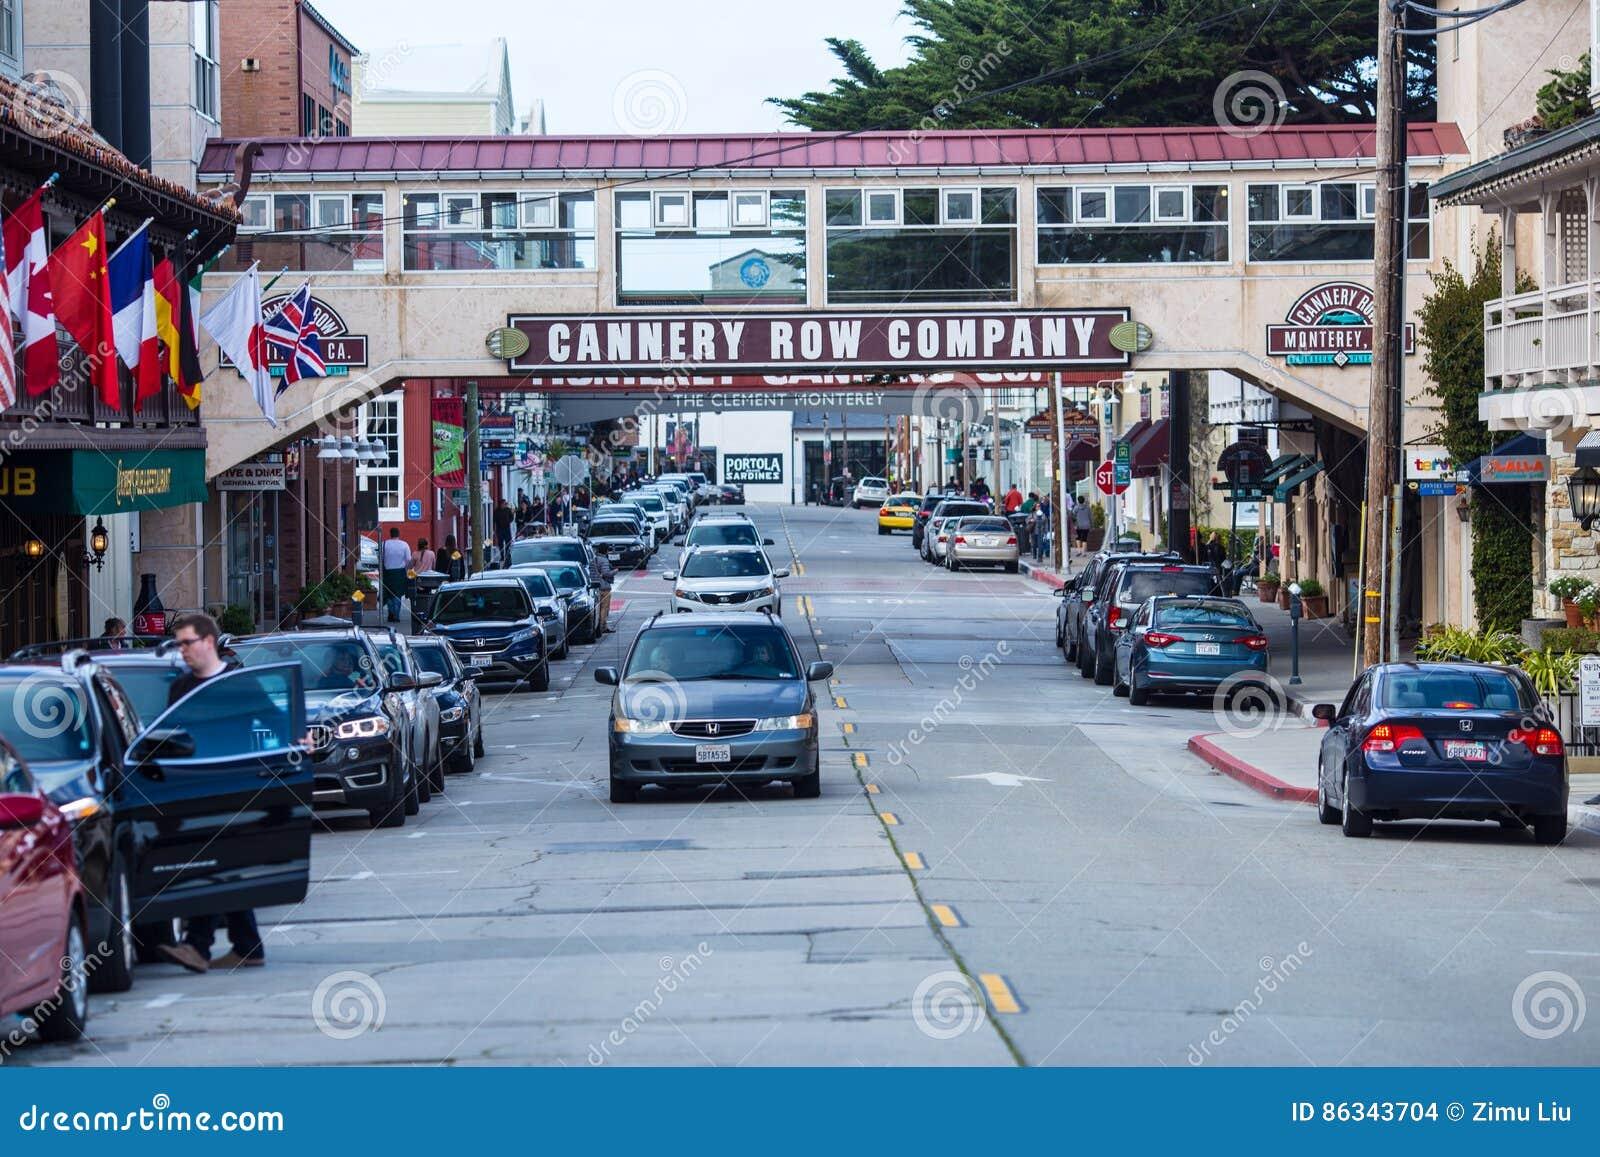 Caneryrij, Monterey